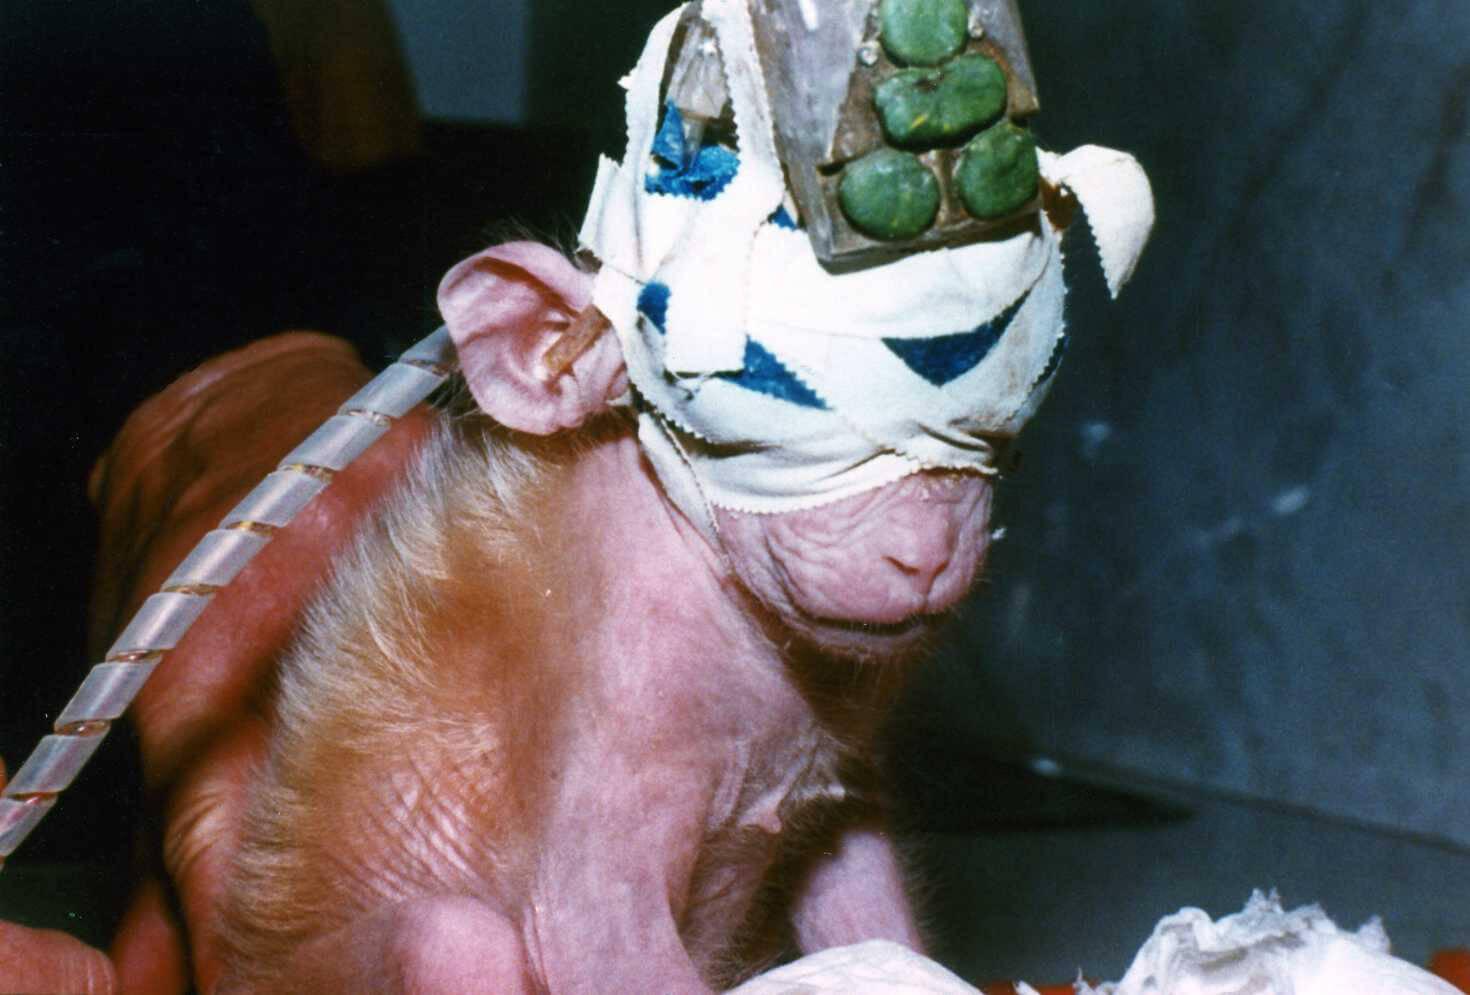 AirFrance monkey experiment